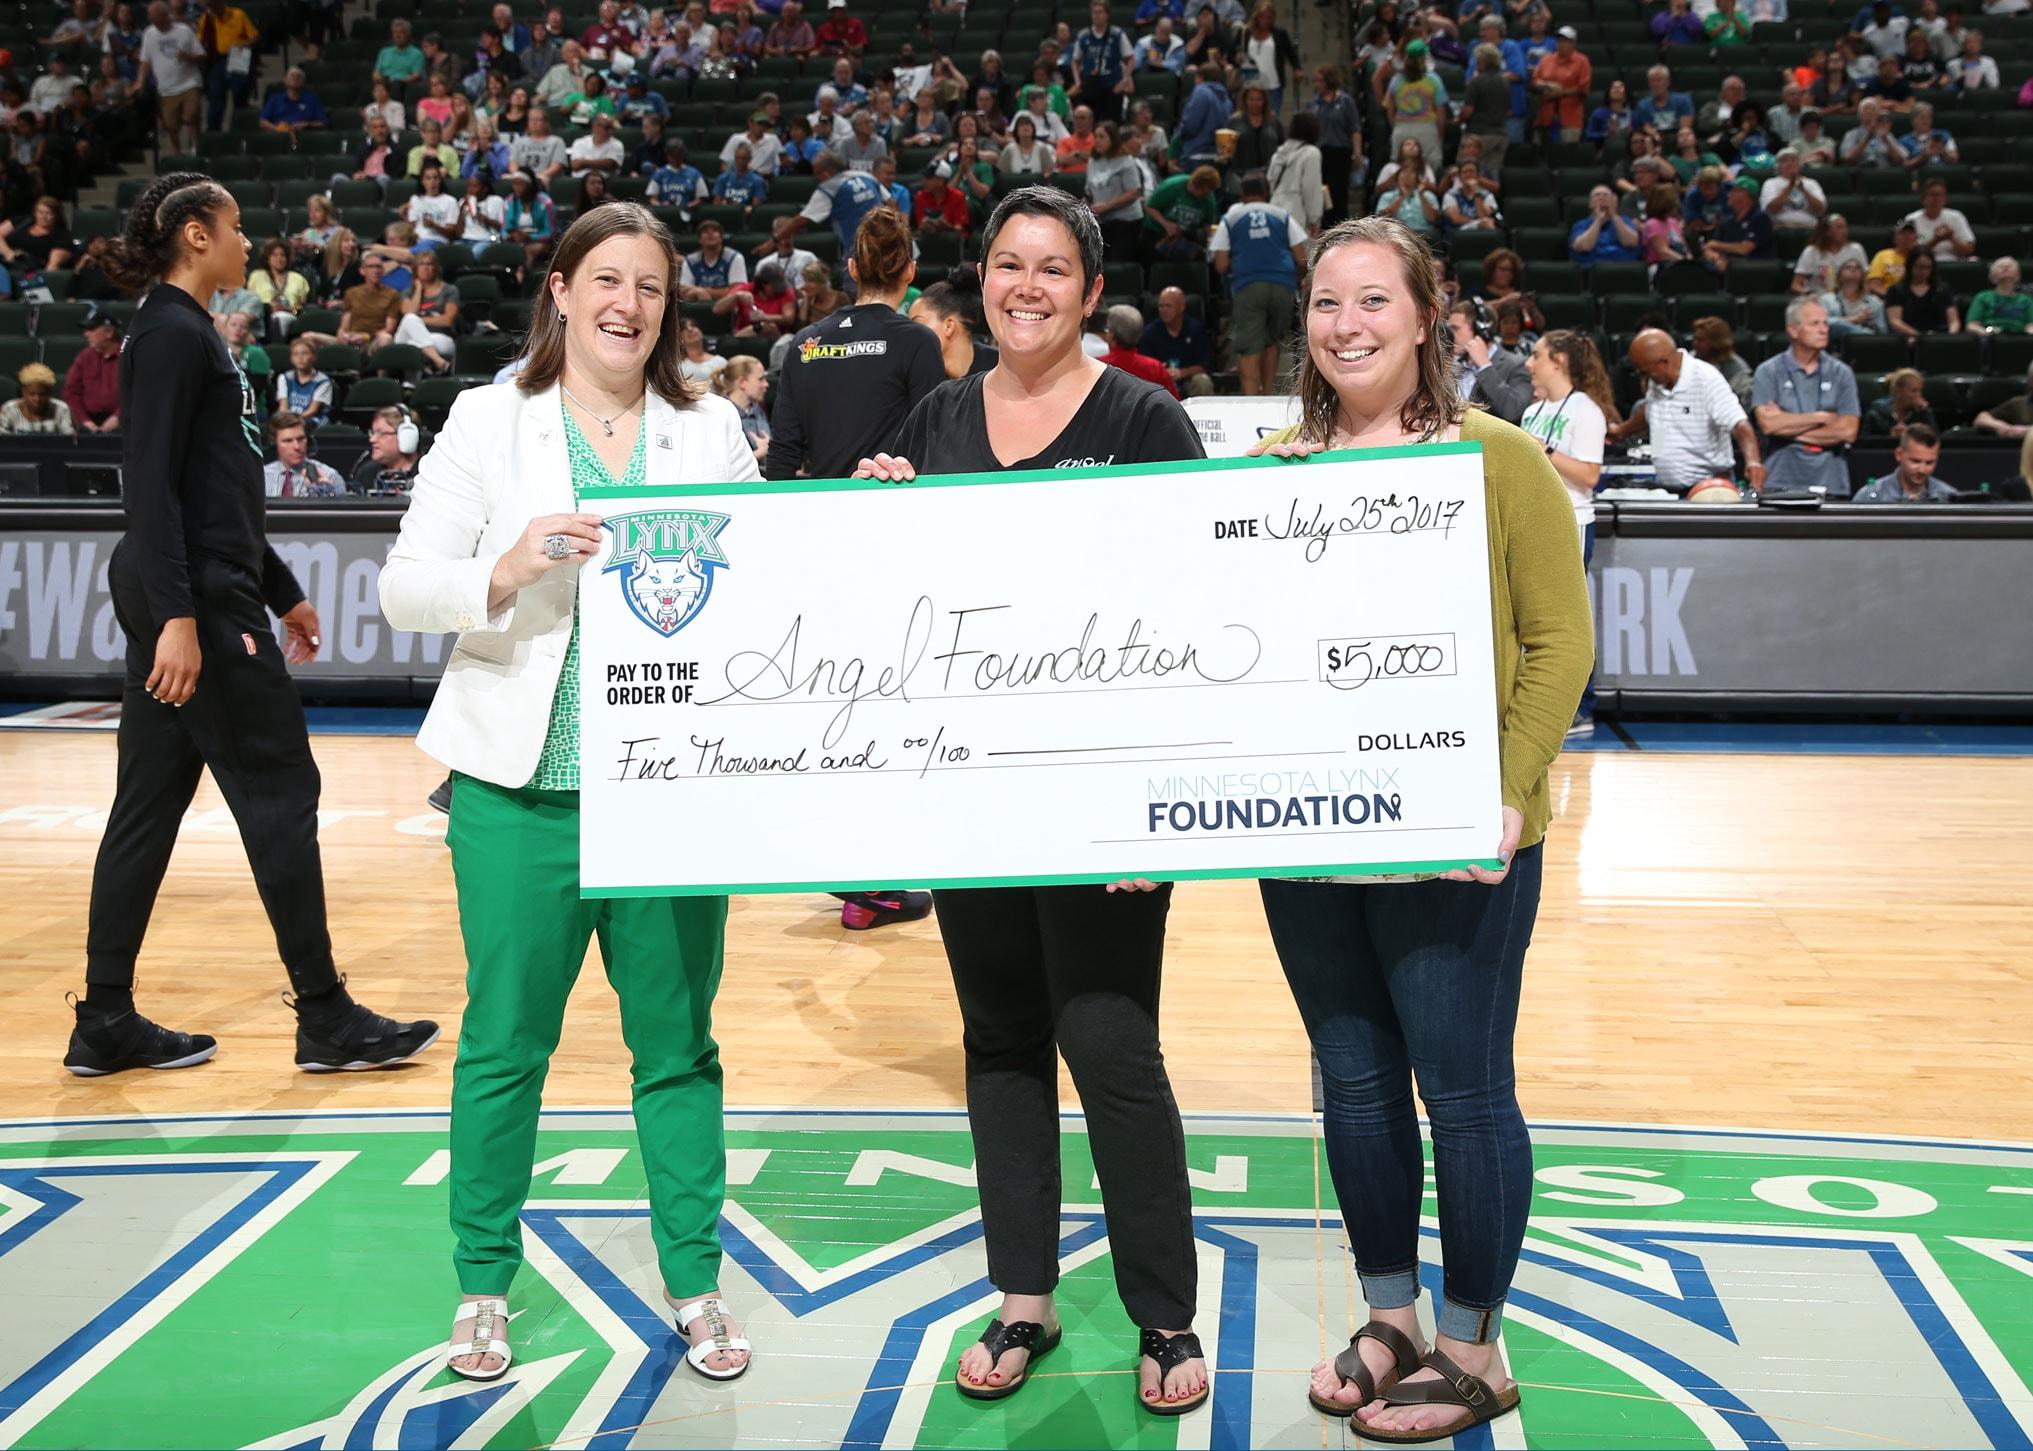 Minnesota Lynx present Angel Foundation with grant